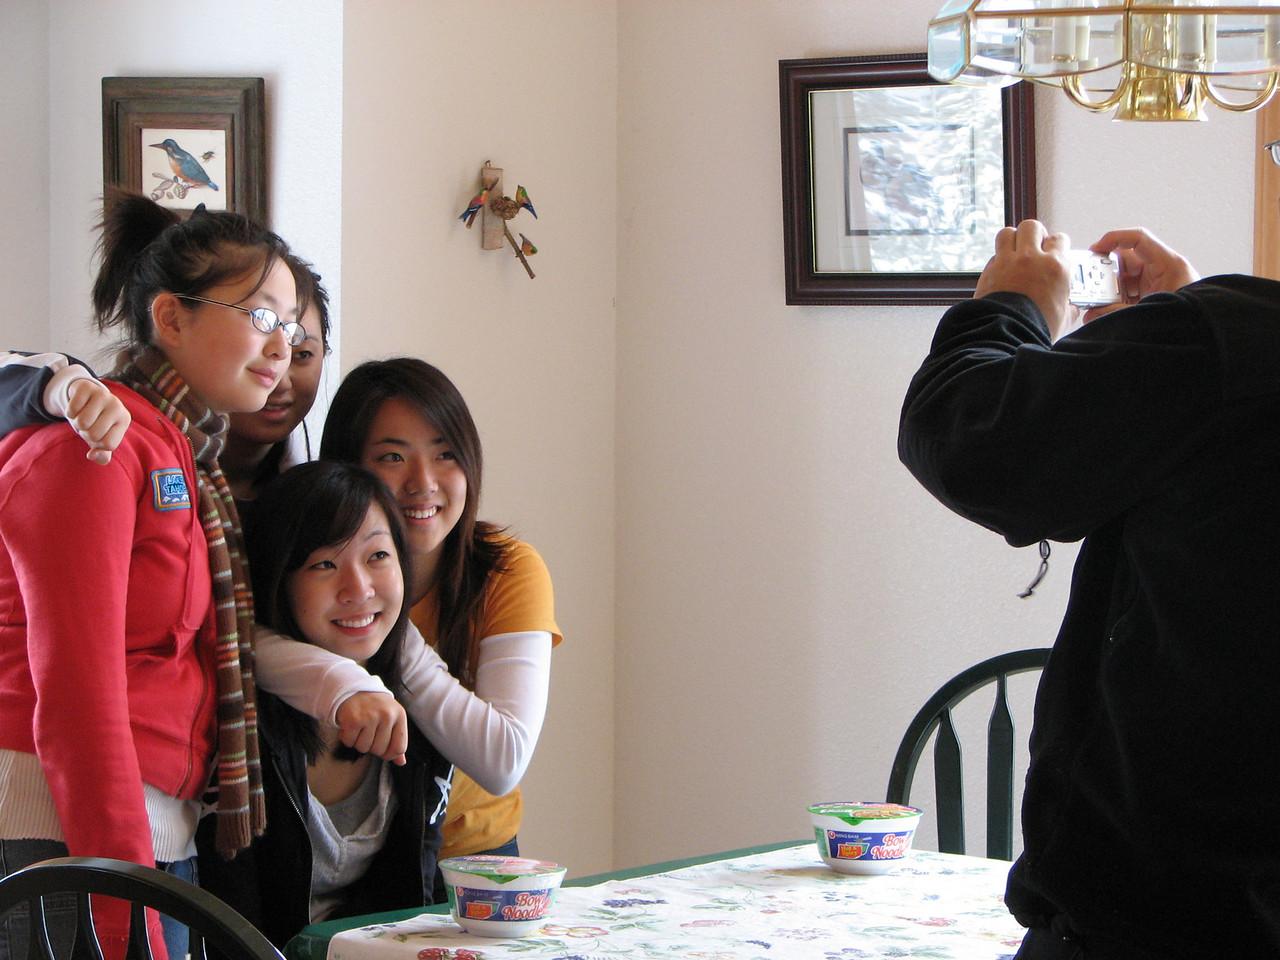 2006 12 23 Sat - Angela Hsu, Stacy Lee, Liz Lee, & Shinae Kim with pic taking Pastor Paul Lee